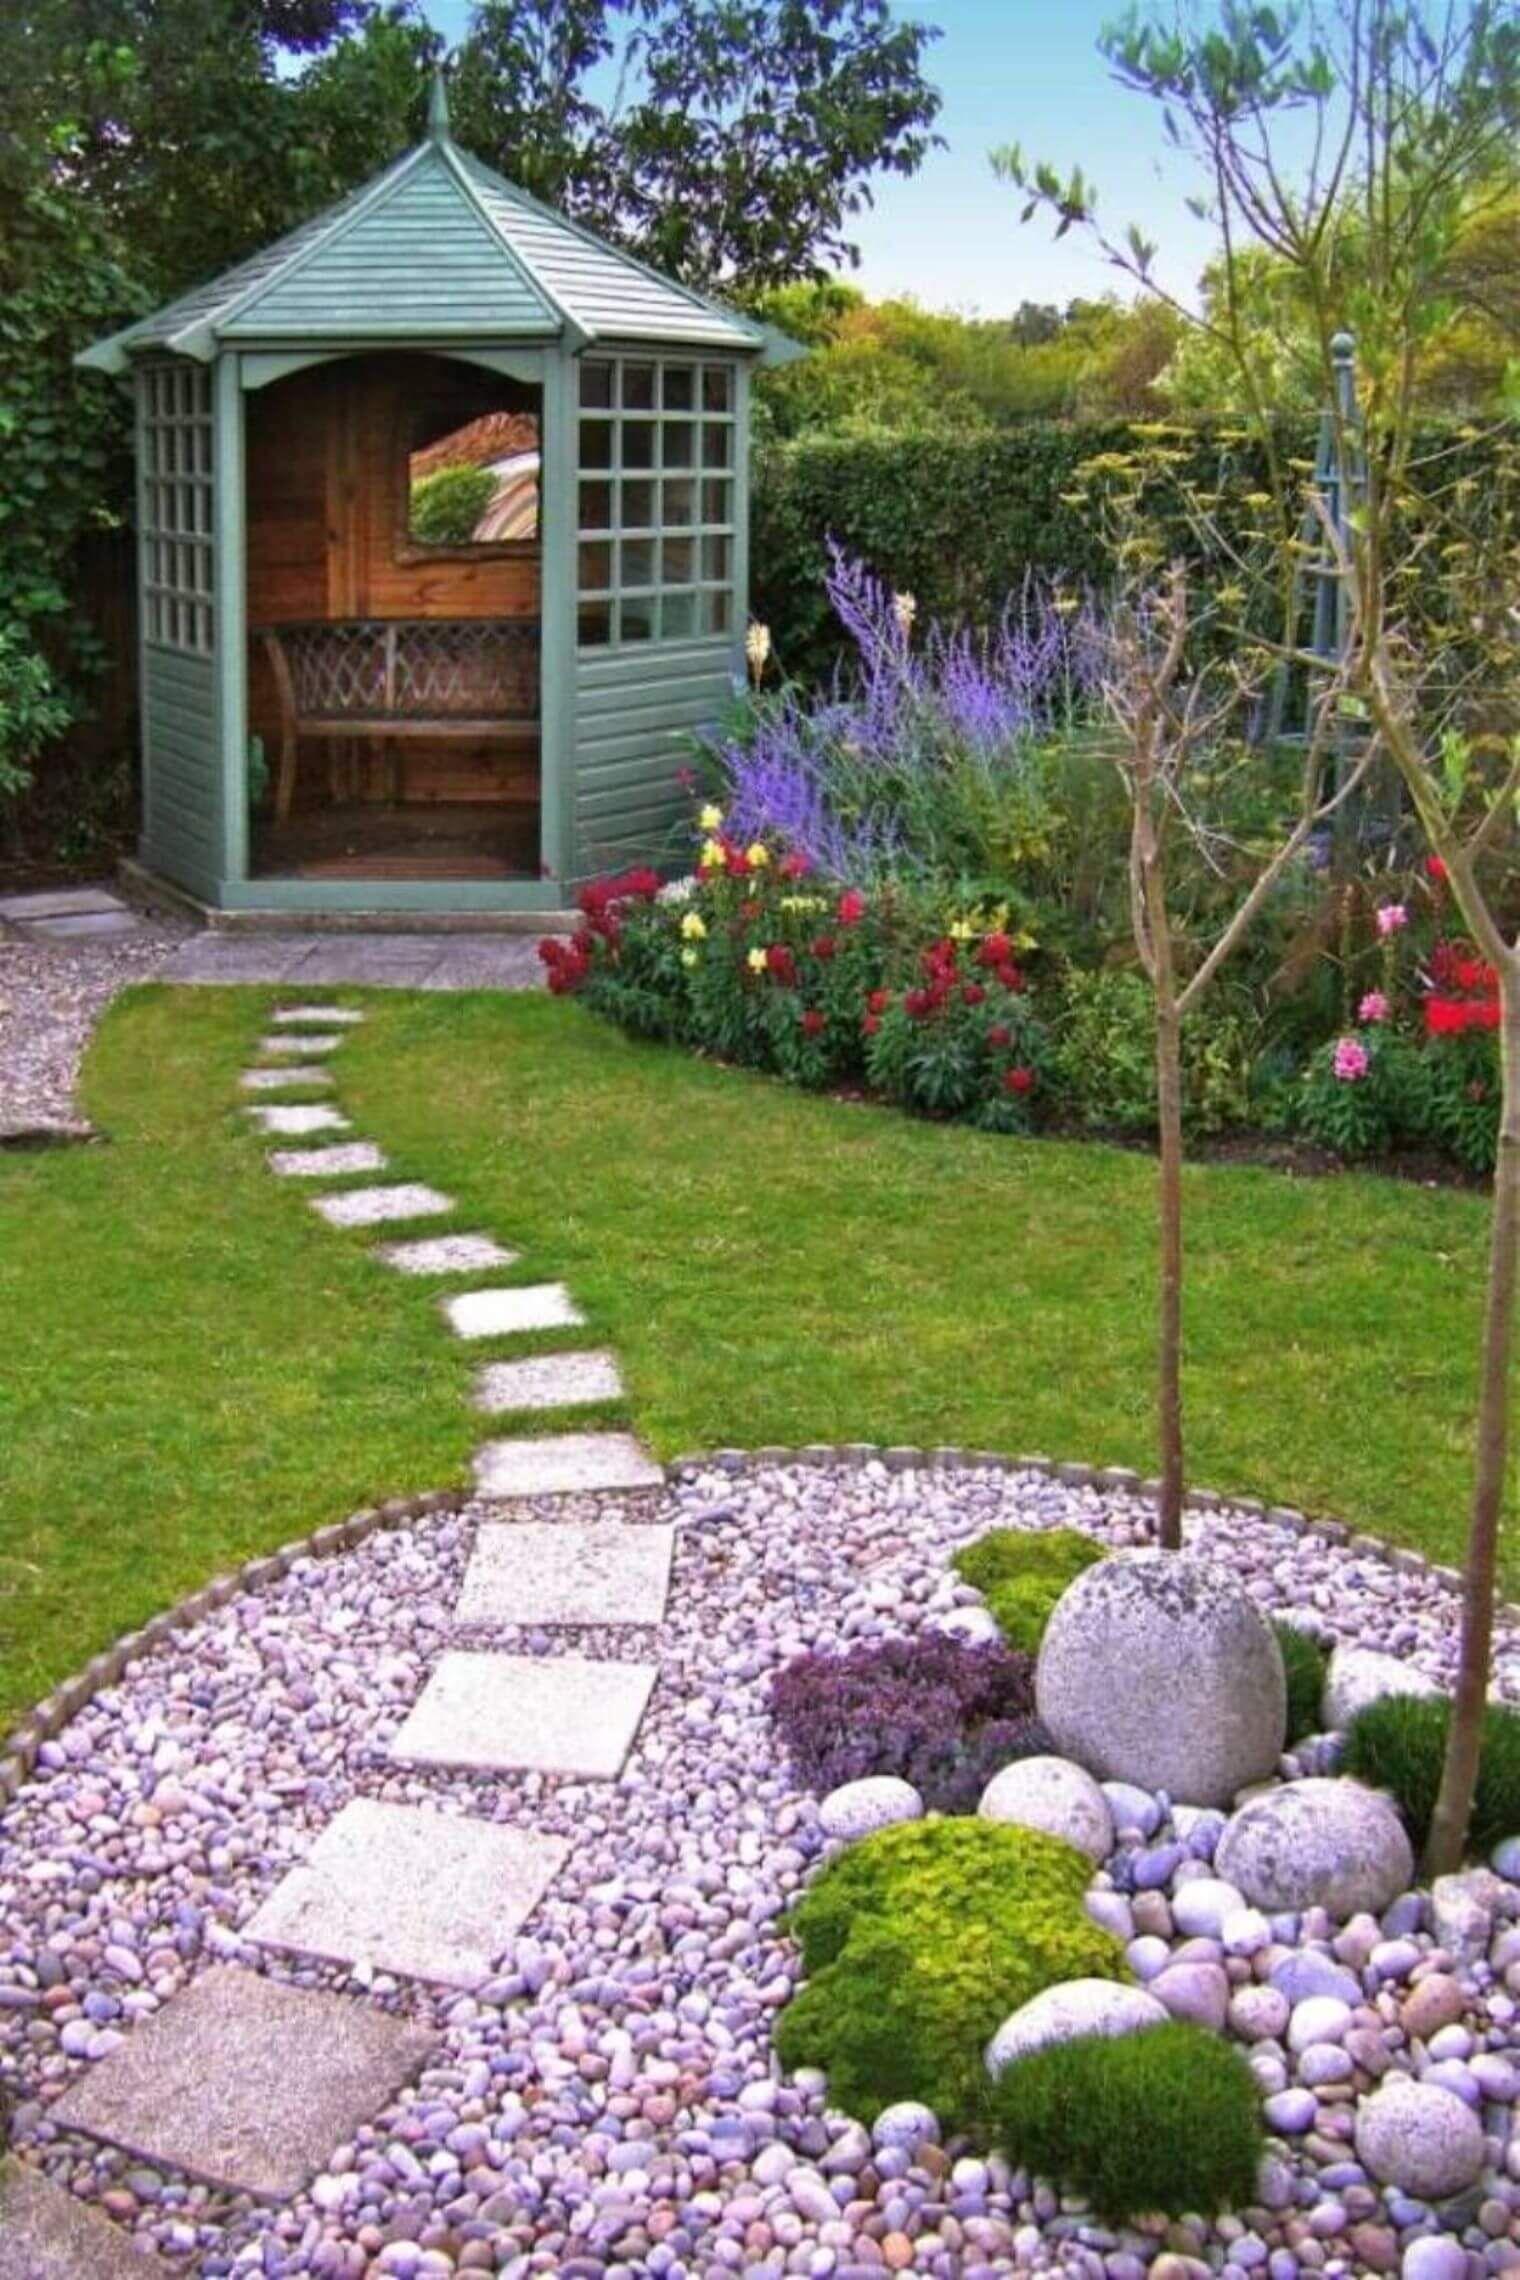 33 Popular Pieces Of Decoration That Are Stepping Stones Farmfoodfamily Small Garden Design Beautiful Gardens Garden Design